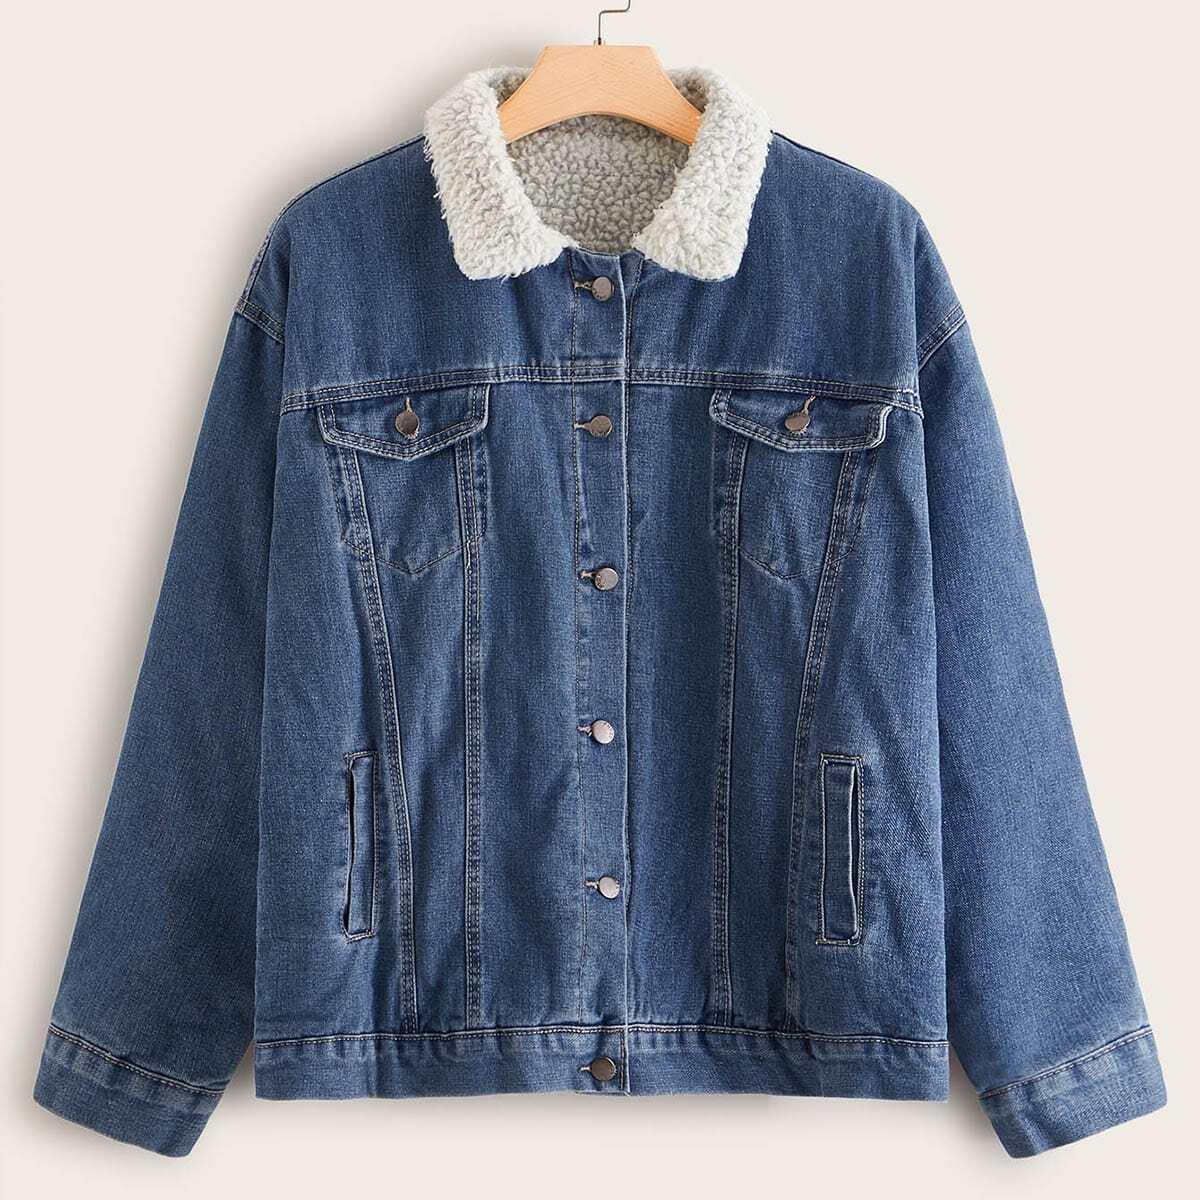 Blauw Casual Vlak Grote maten: jeansjassen